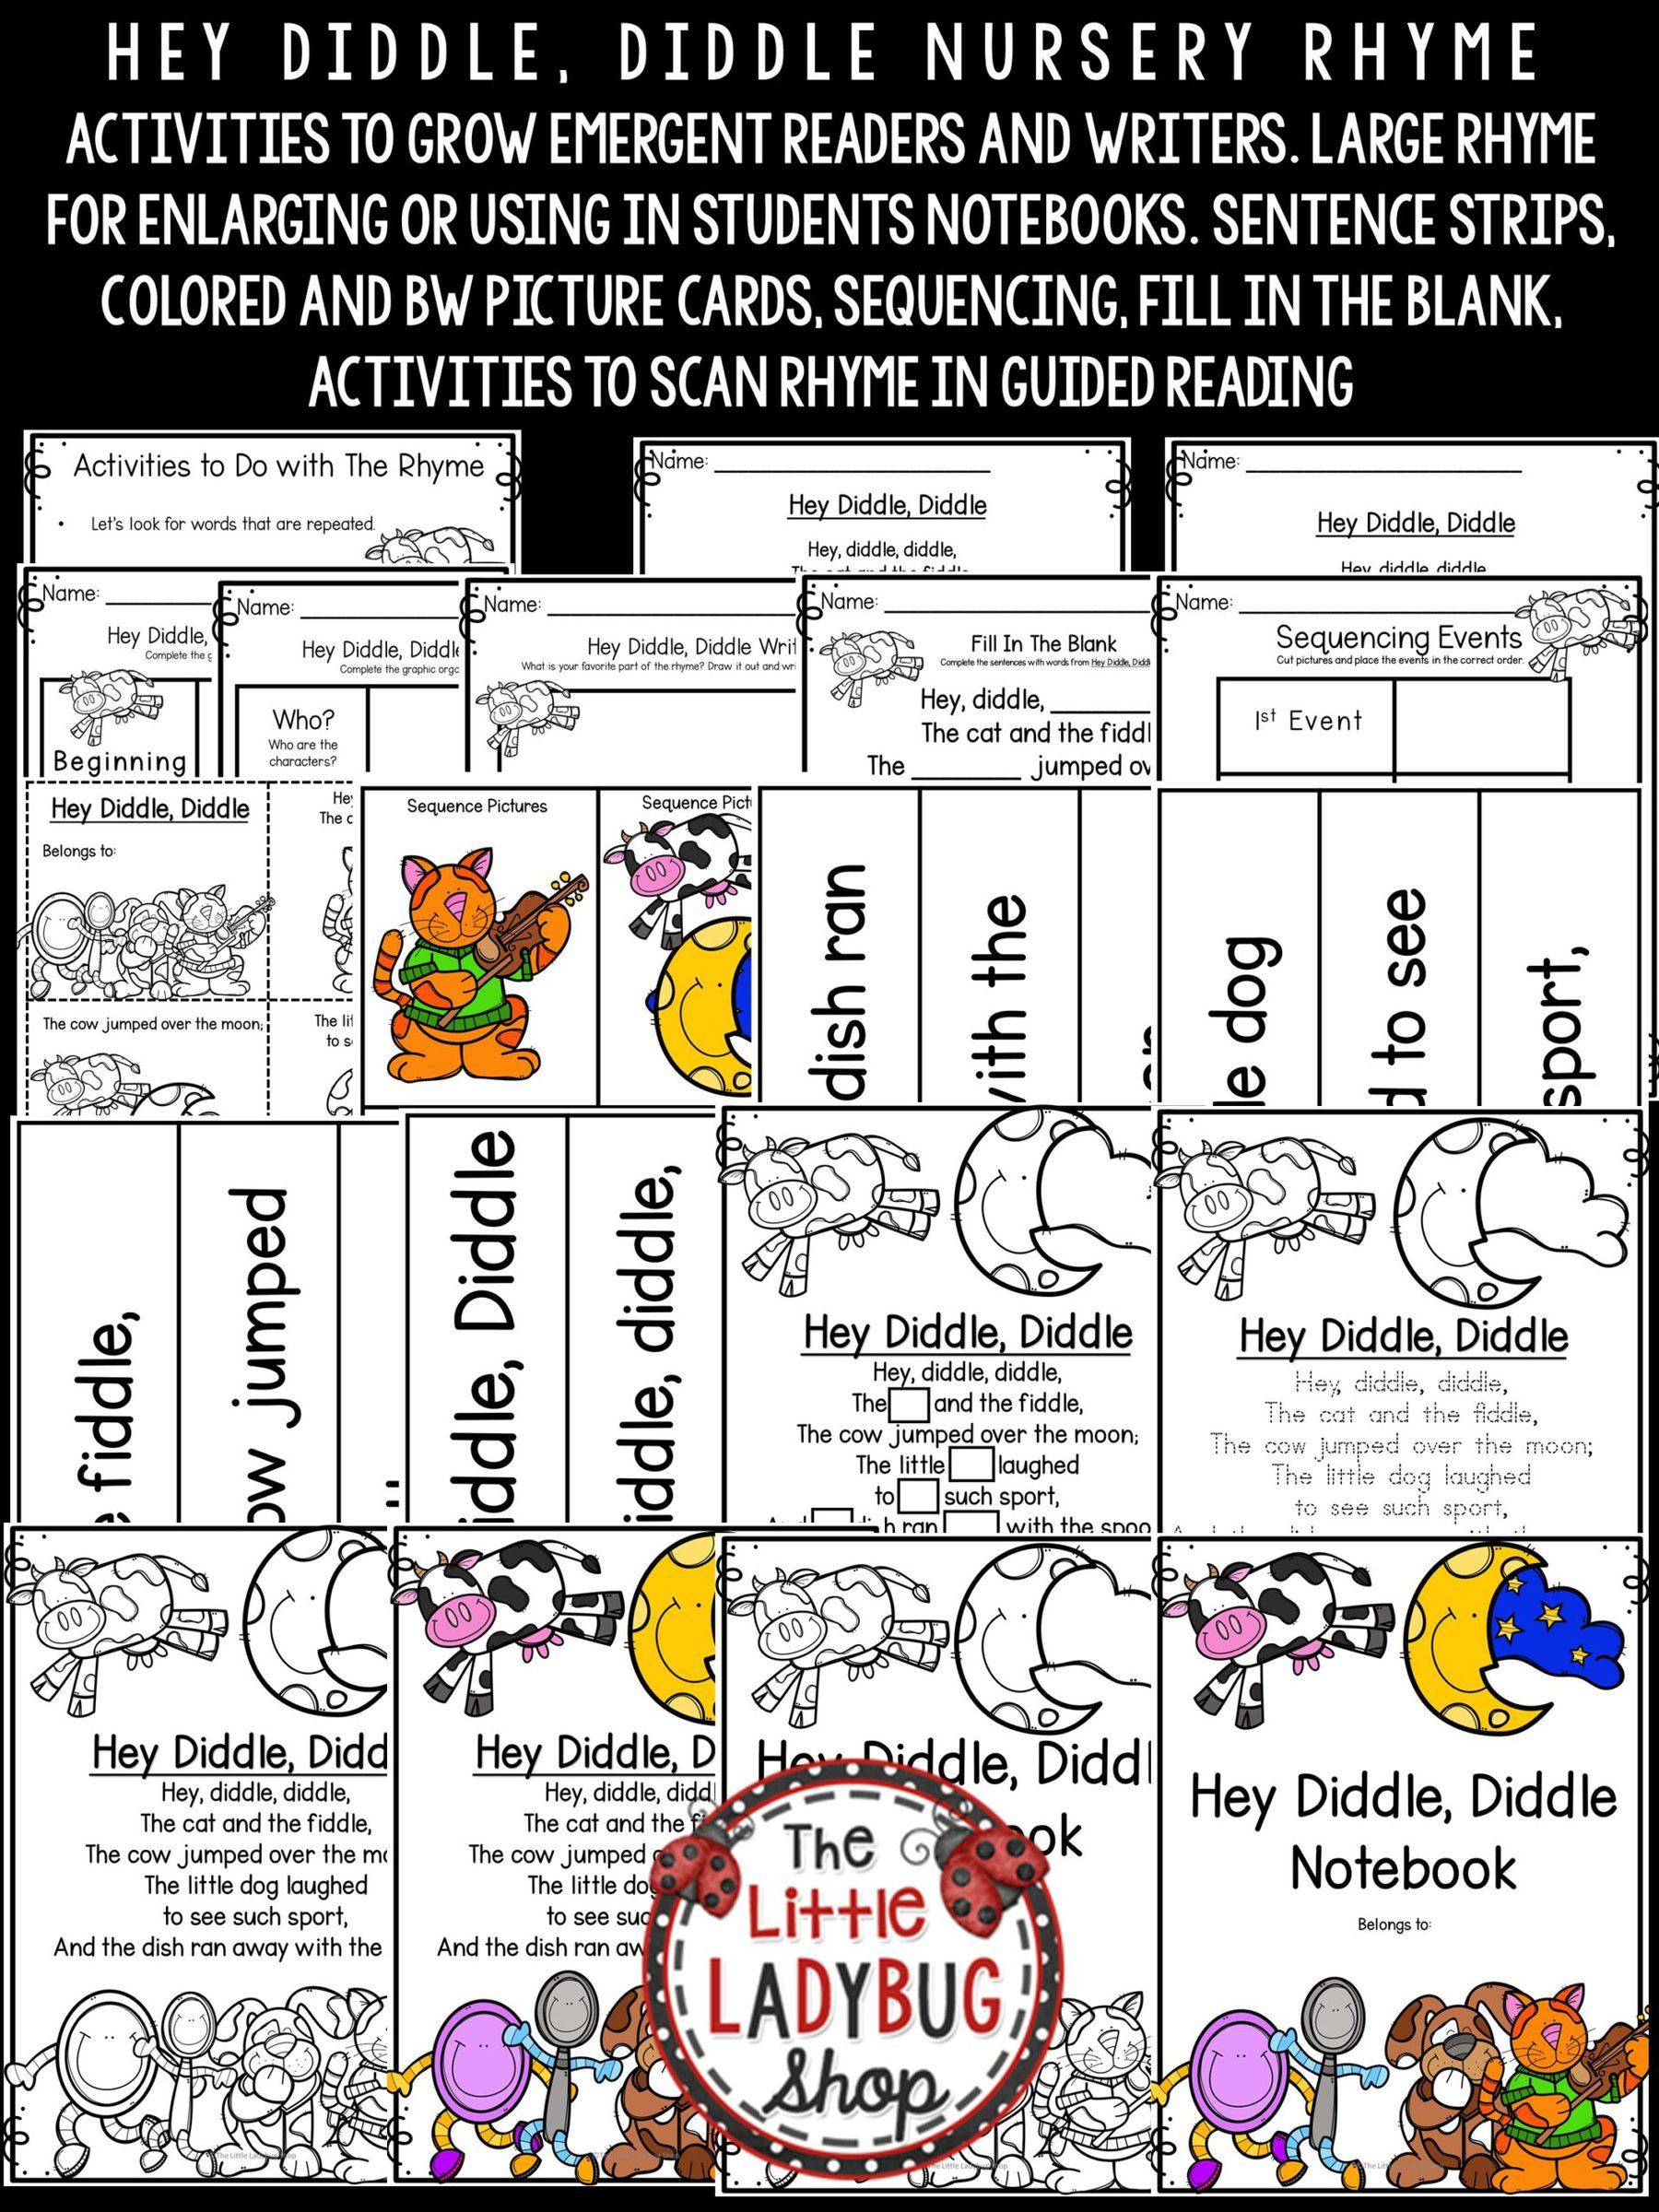 Hey Diddle Diddle Nursery Rhyme For Kindergarten Nursery